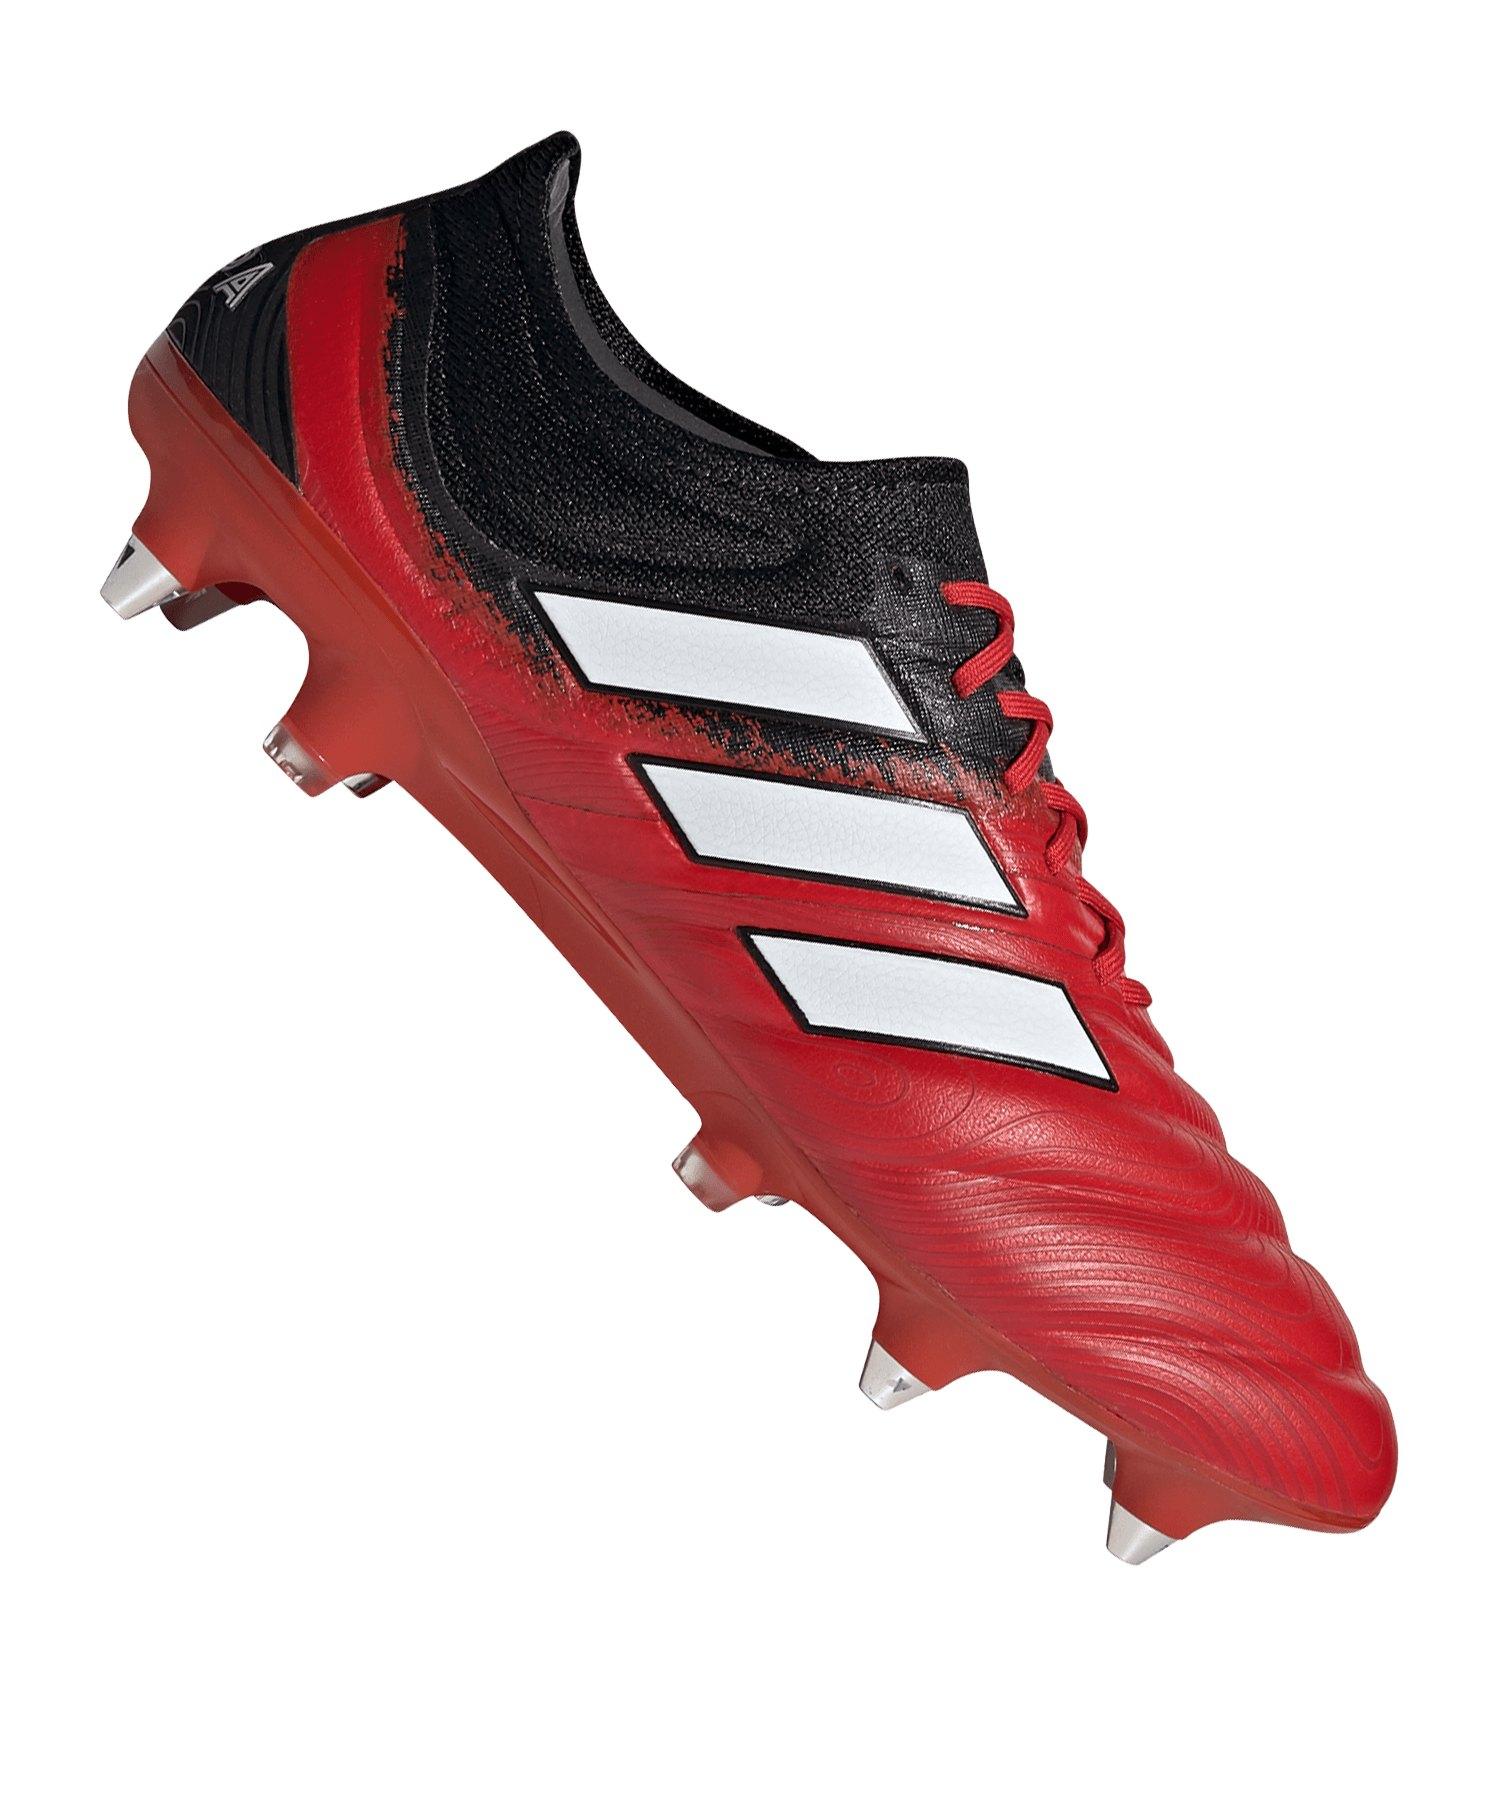 adidas COPA 20.1 SG Rot Schwarz - rot